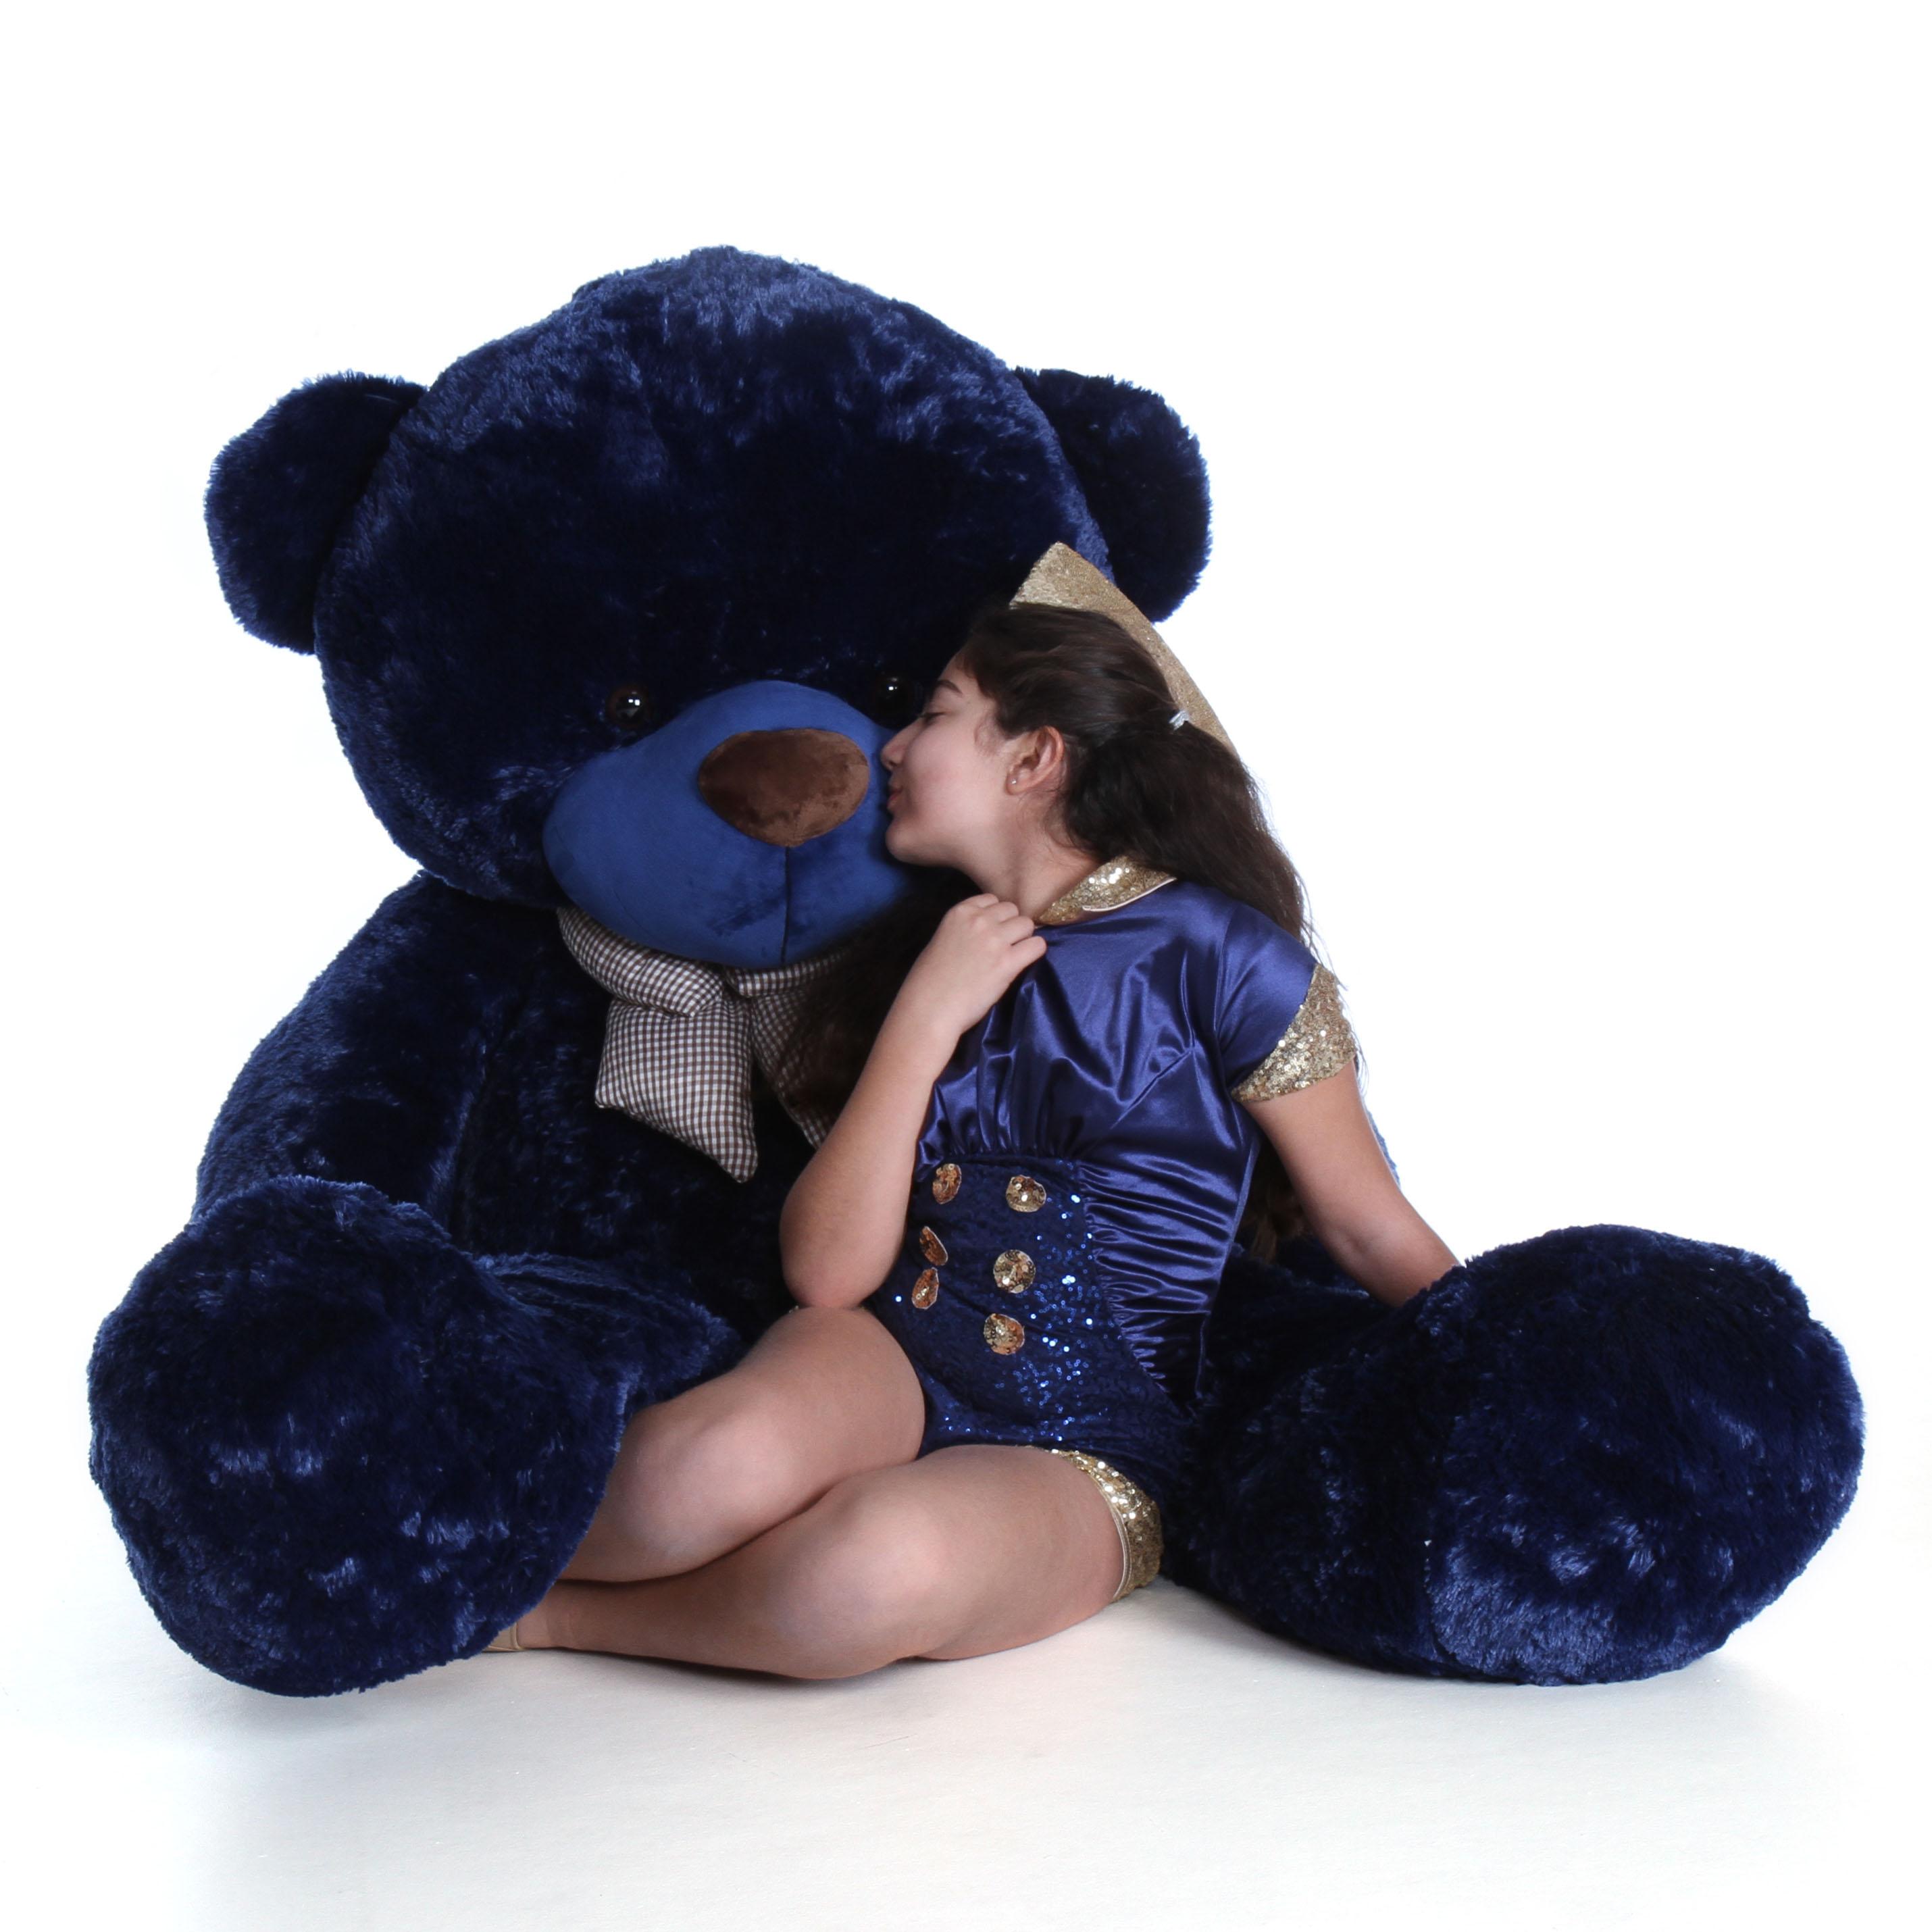 72in-giant-teddy-royce-cuddles-navy-blue-huge-soft-bear.jpg